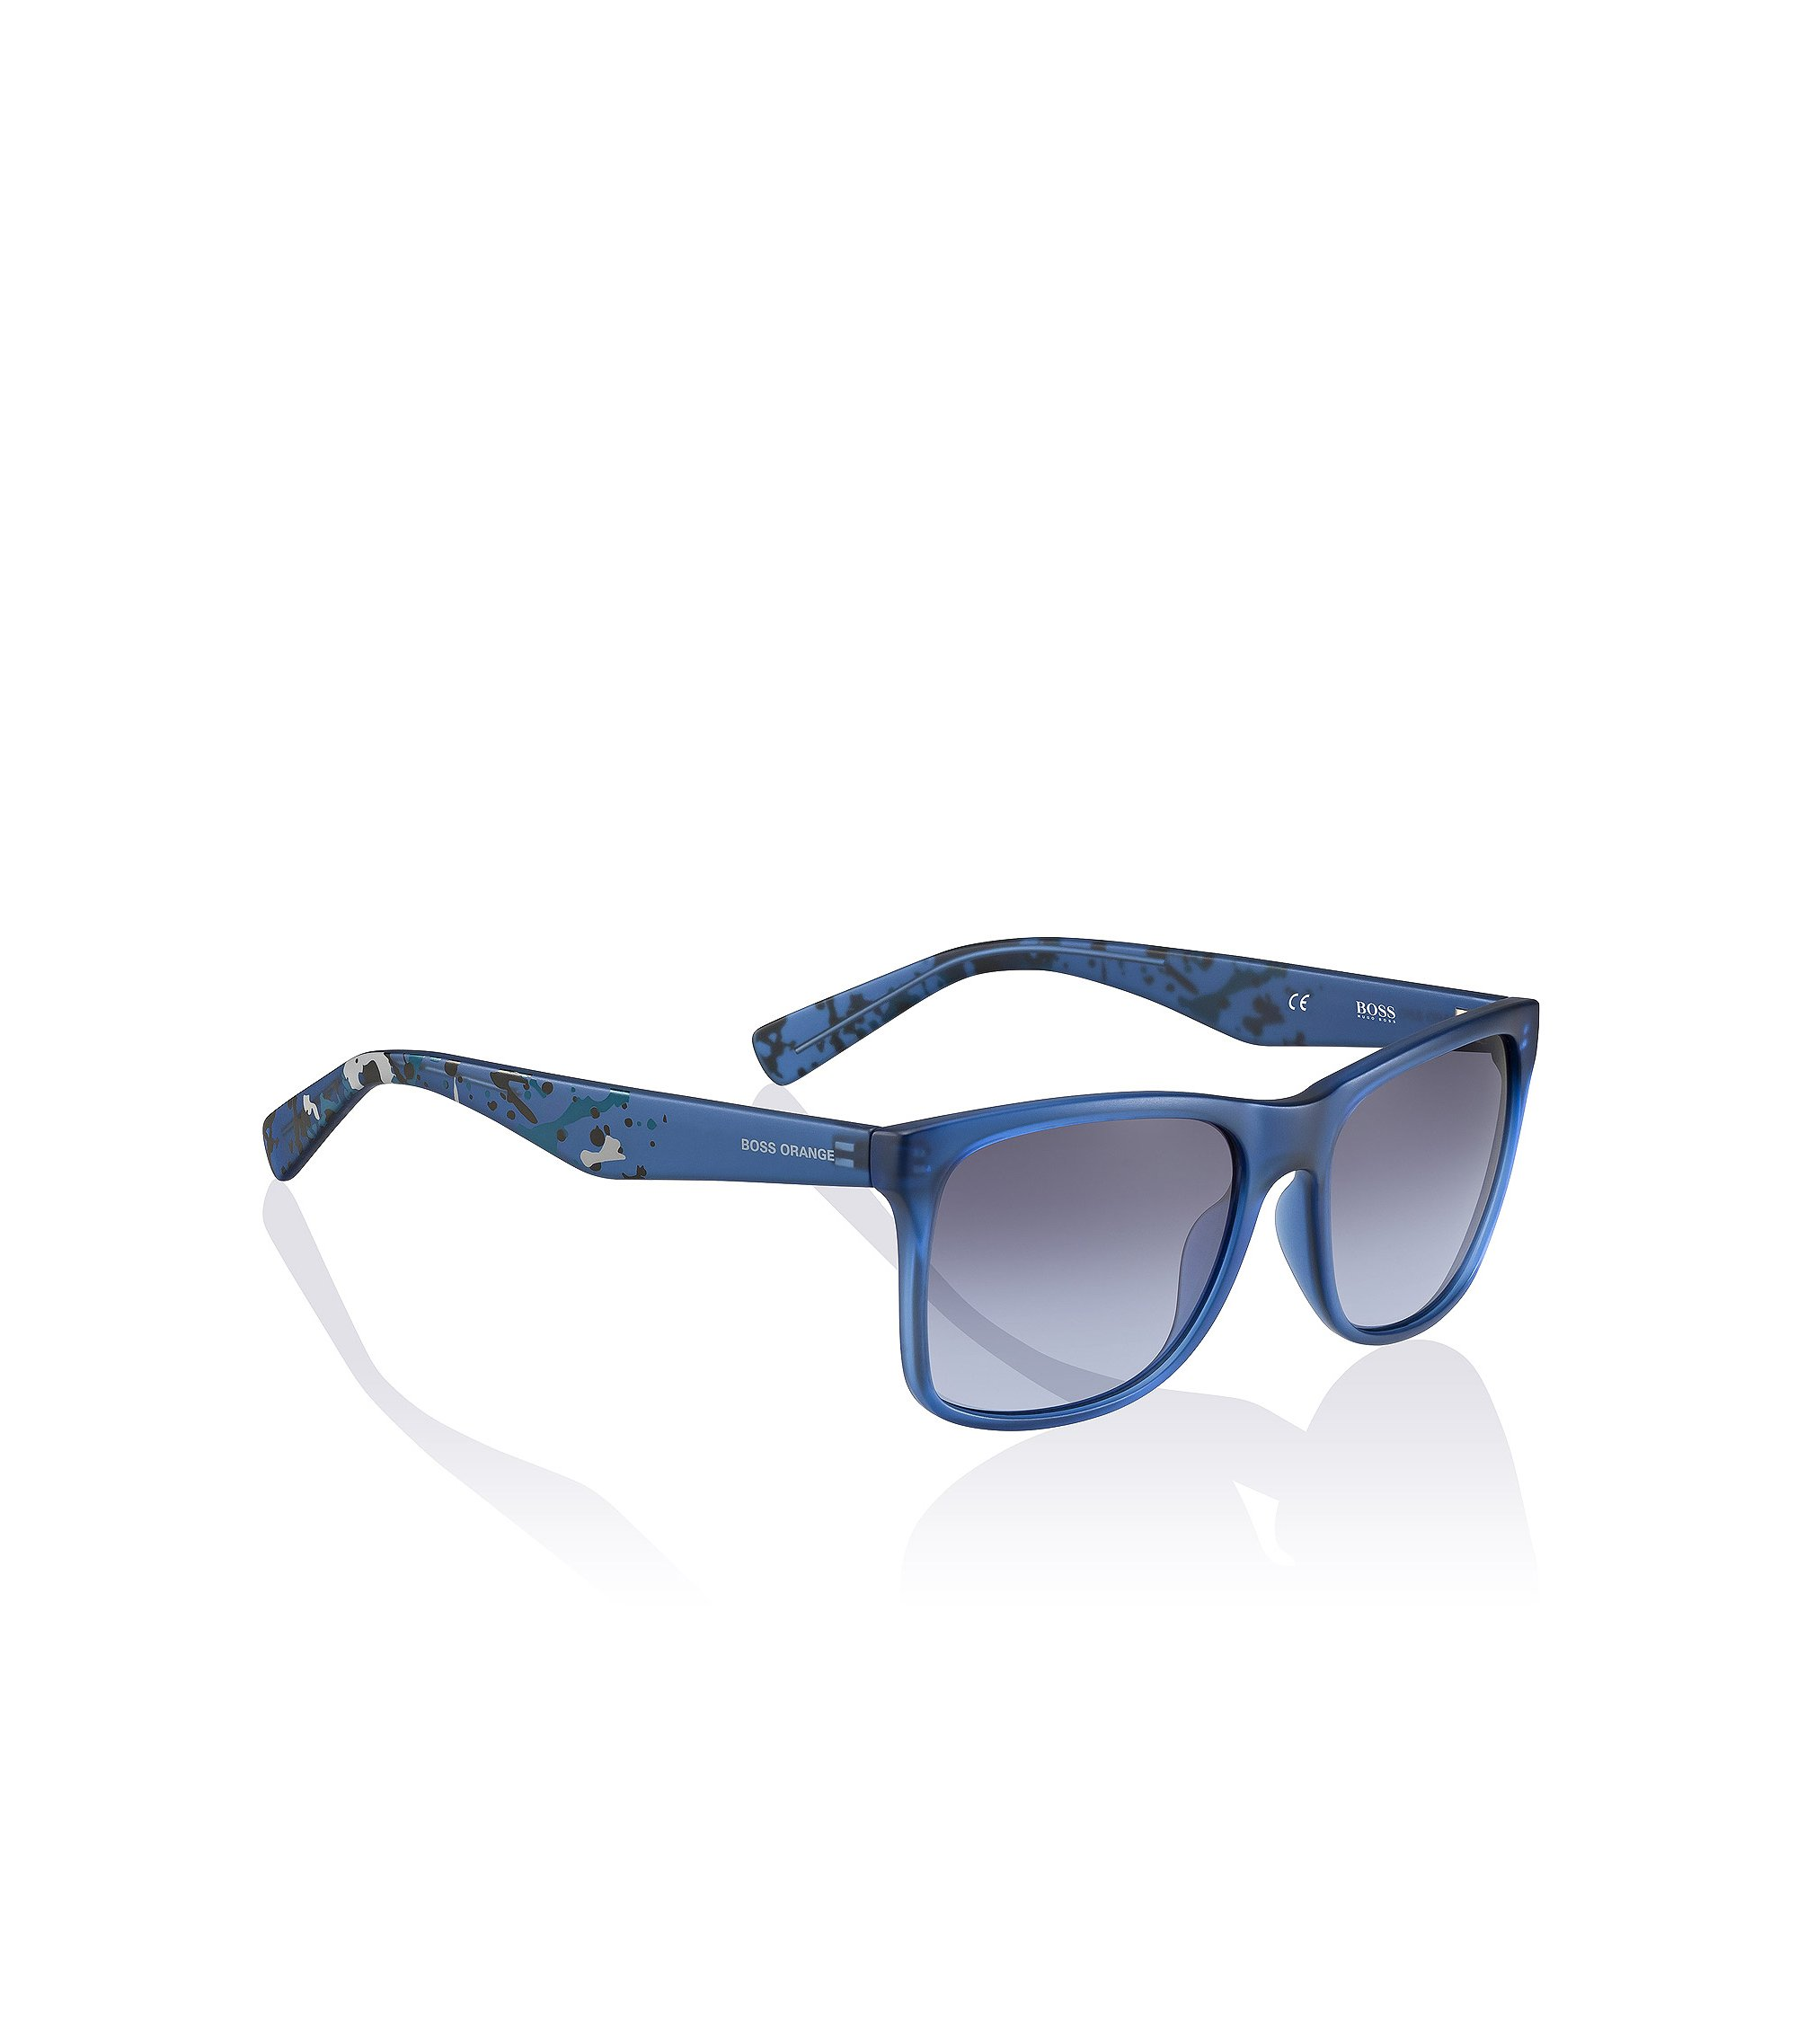 Sonnenbrille ´BO 0211/S`, Assorted-Pre-Pack